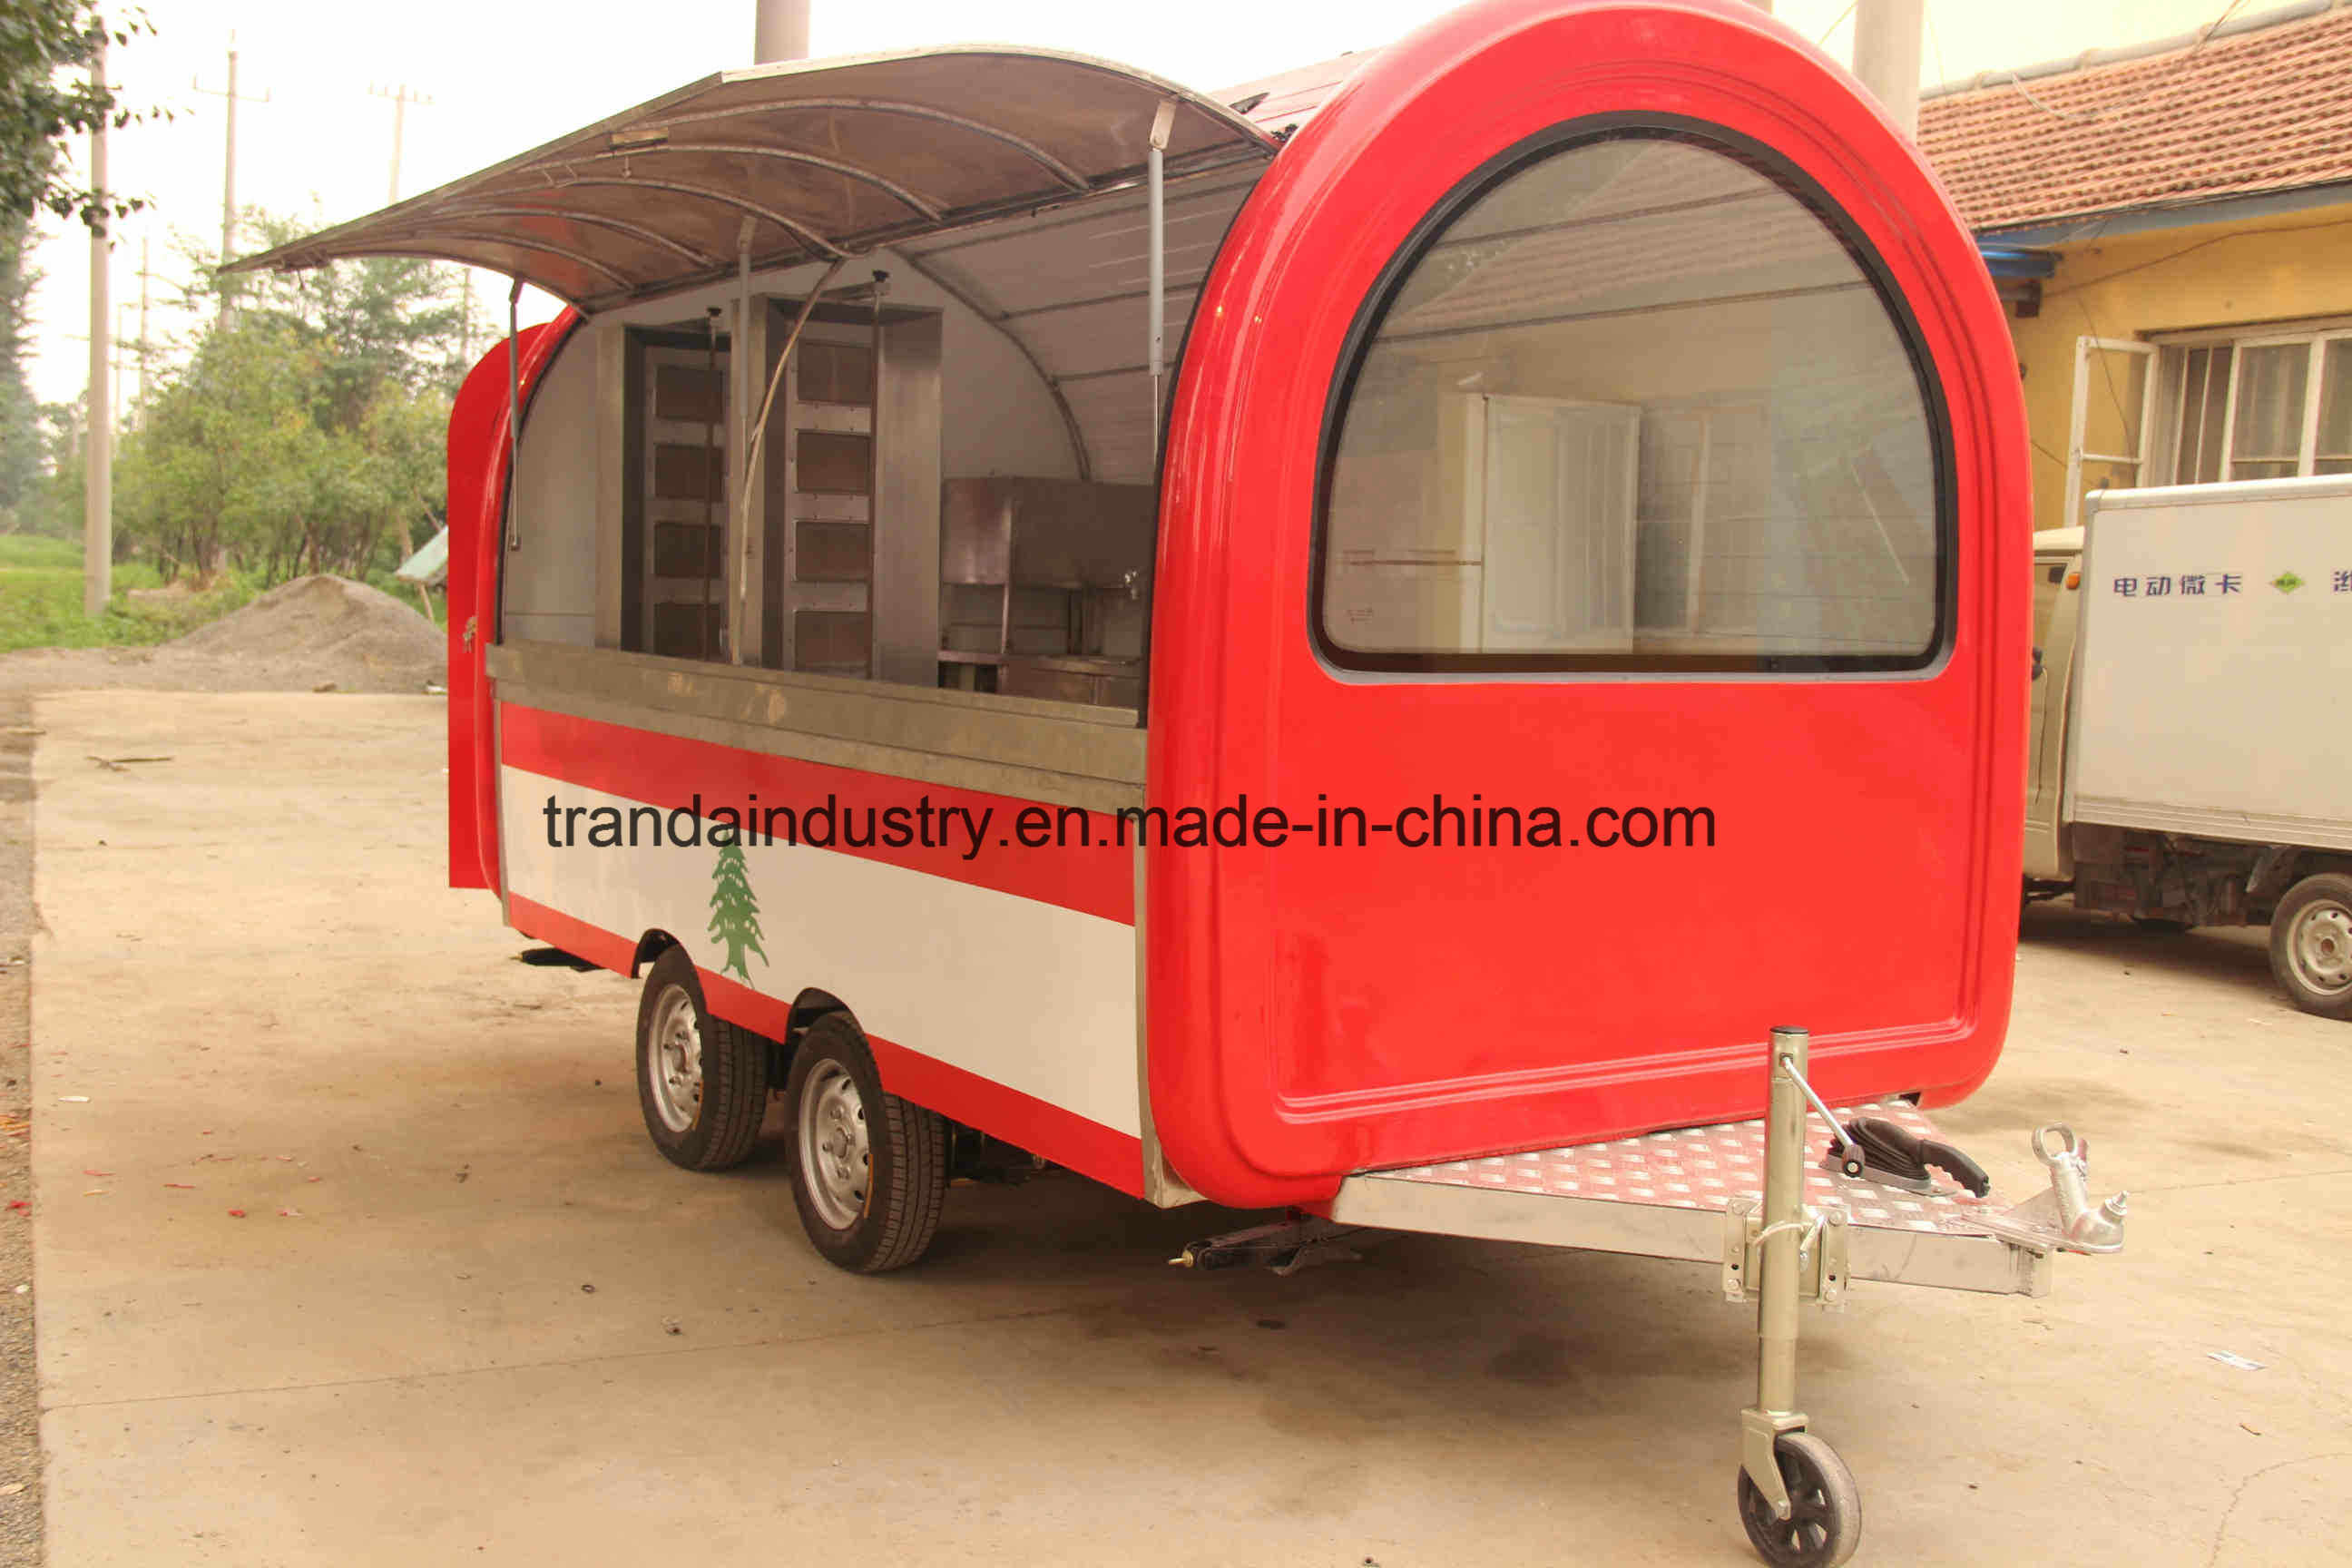 China Supplier Breakfast Kiosk Used Food Truck Sale